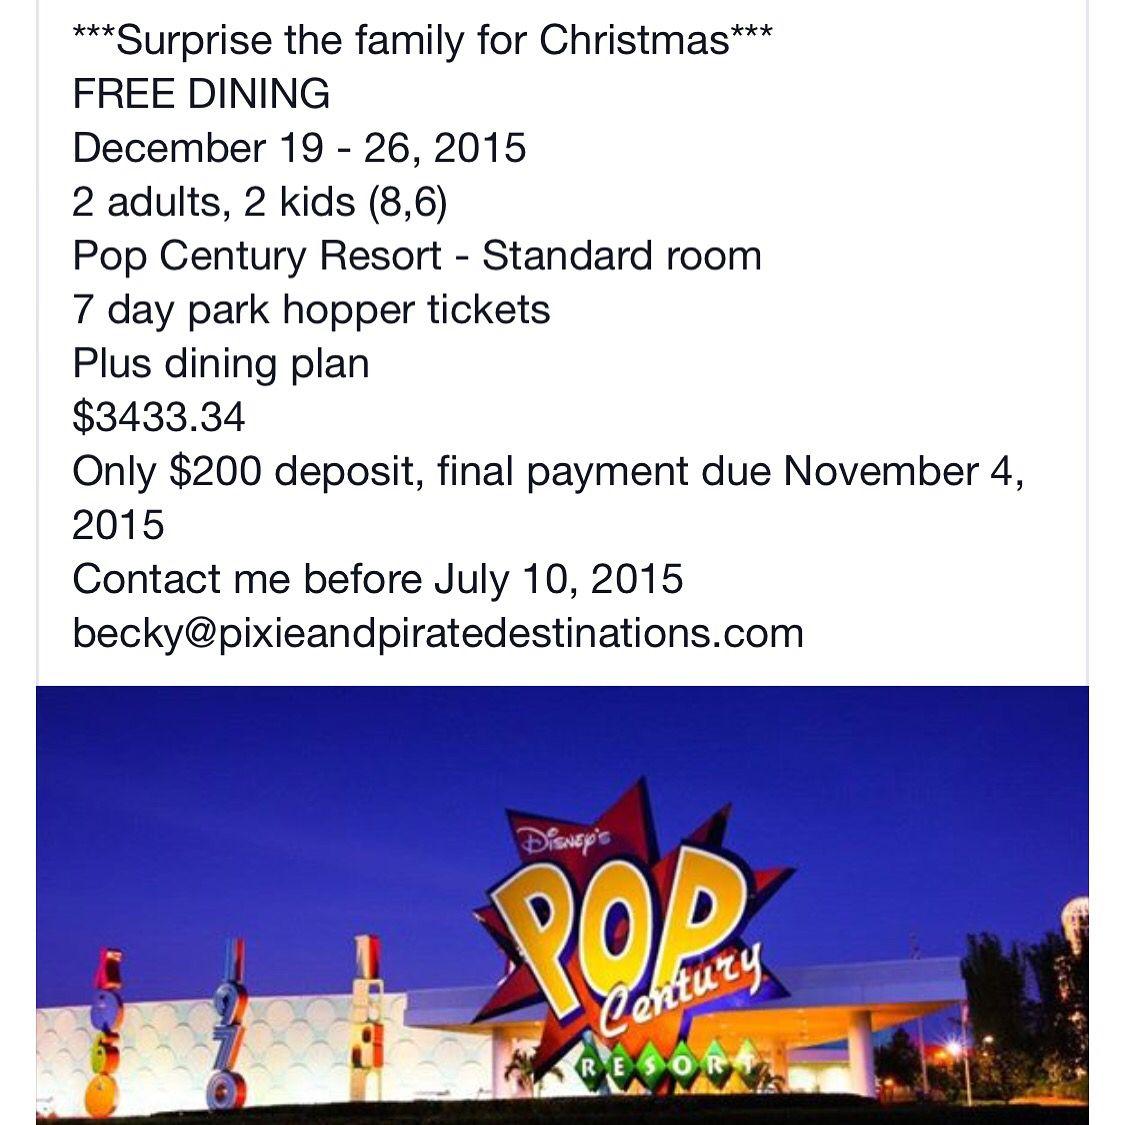 Christmas at Disney with FREE dining   Disney World   Pinterest